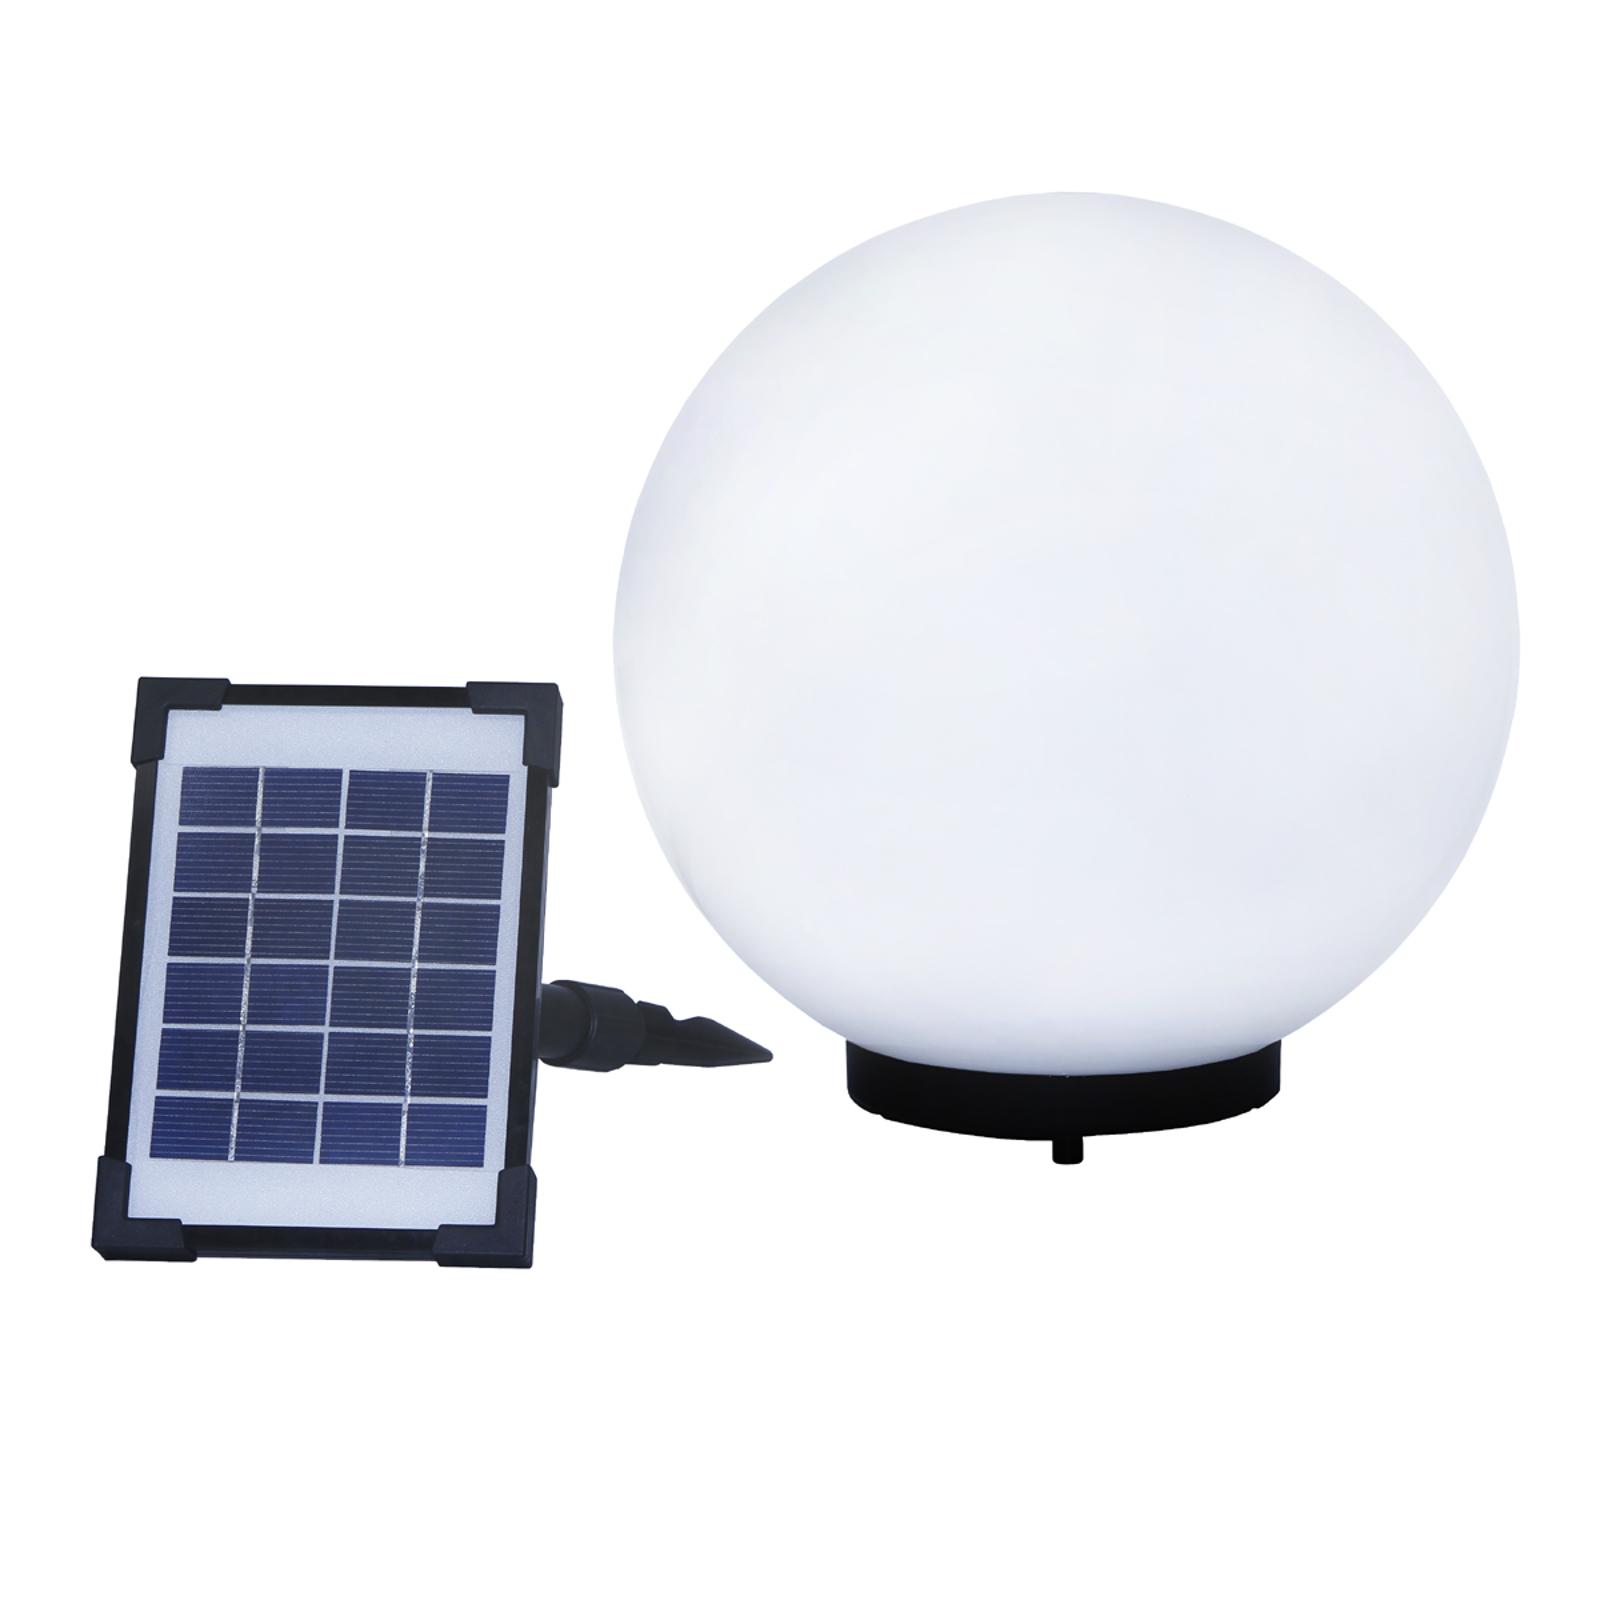 Decorative spherical solar lamp Mega Ball_3012224_1